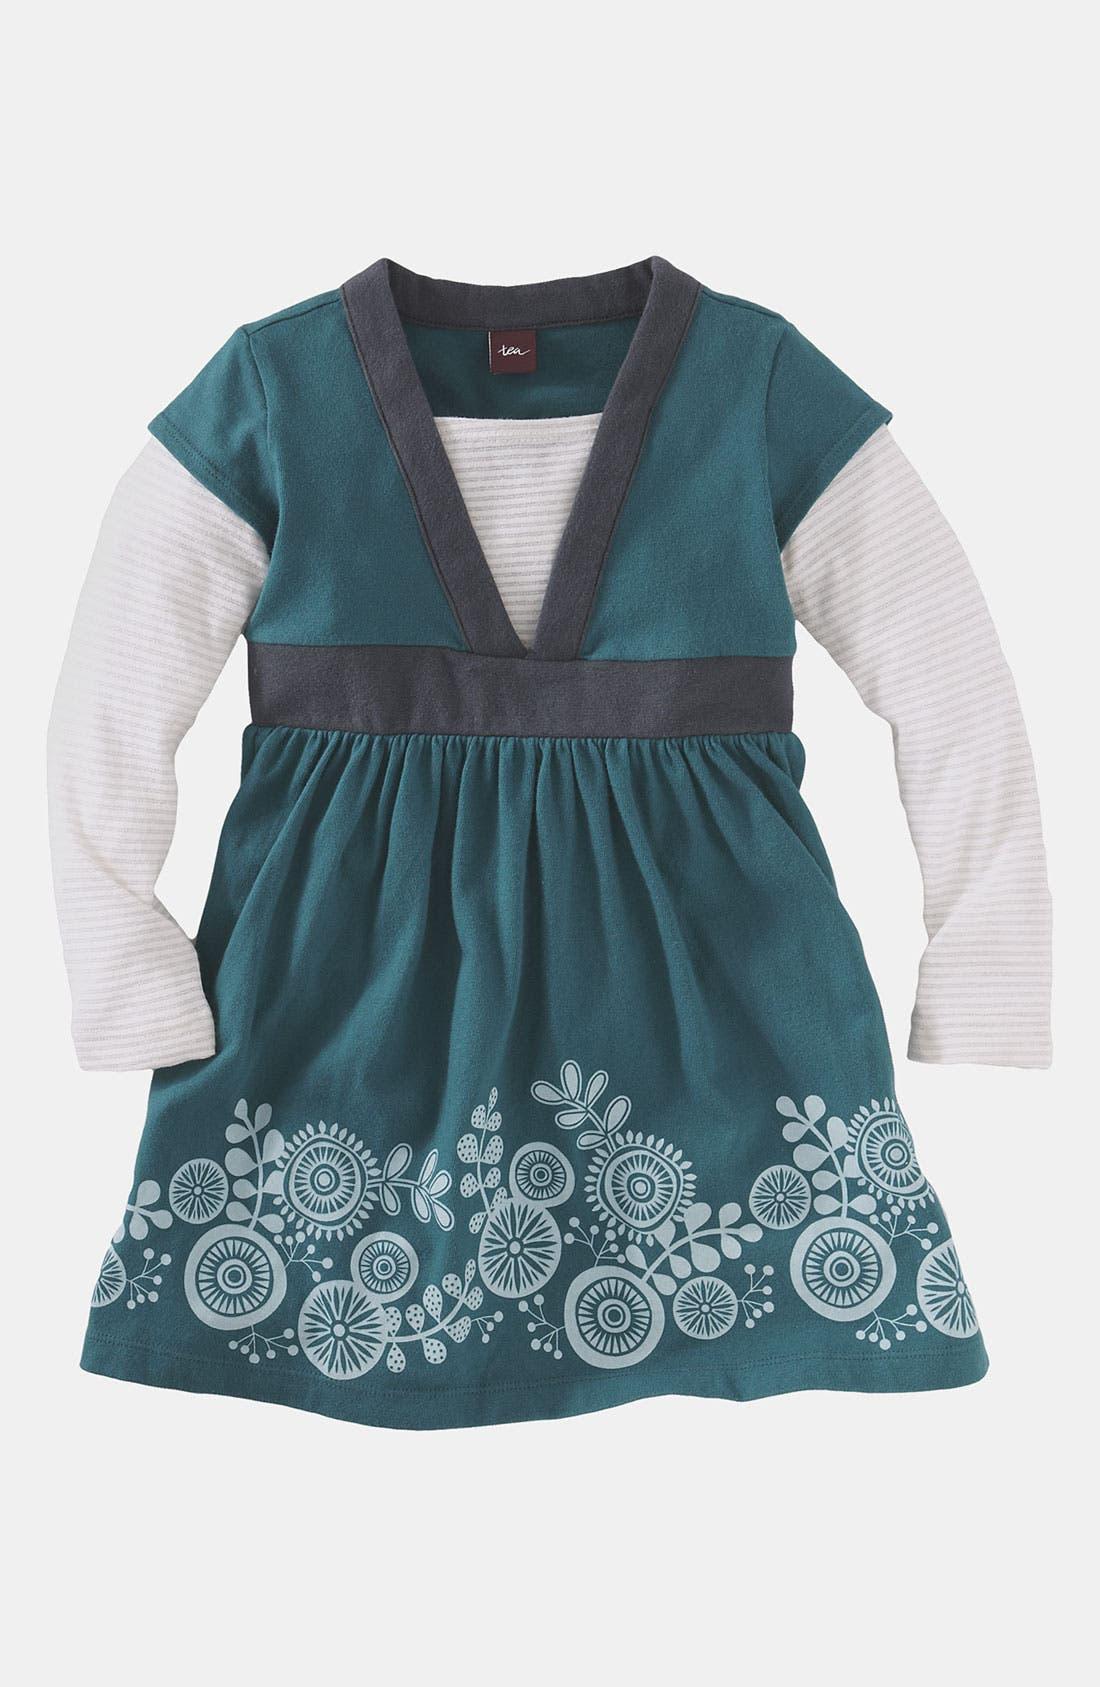 Main Image - Tea Collection 'Pinwheel' Layered Sleeve Dress (Toddler)